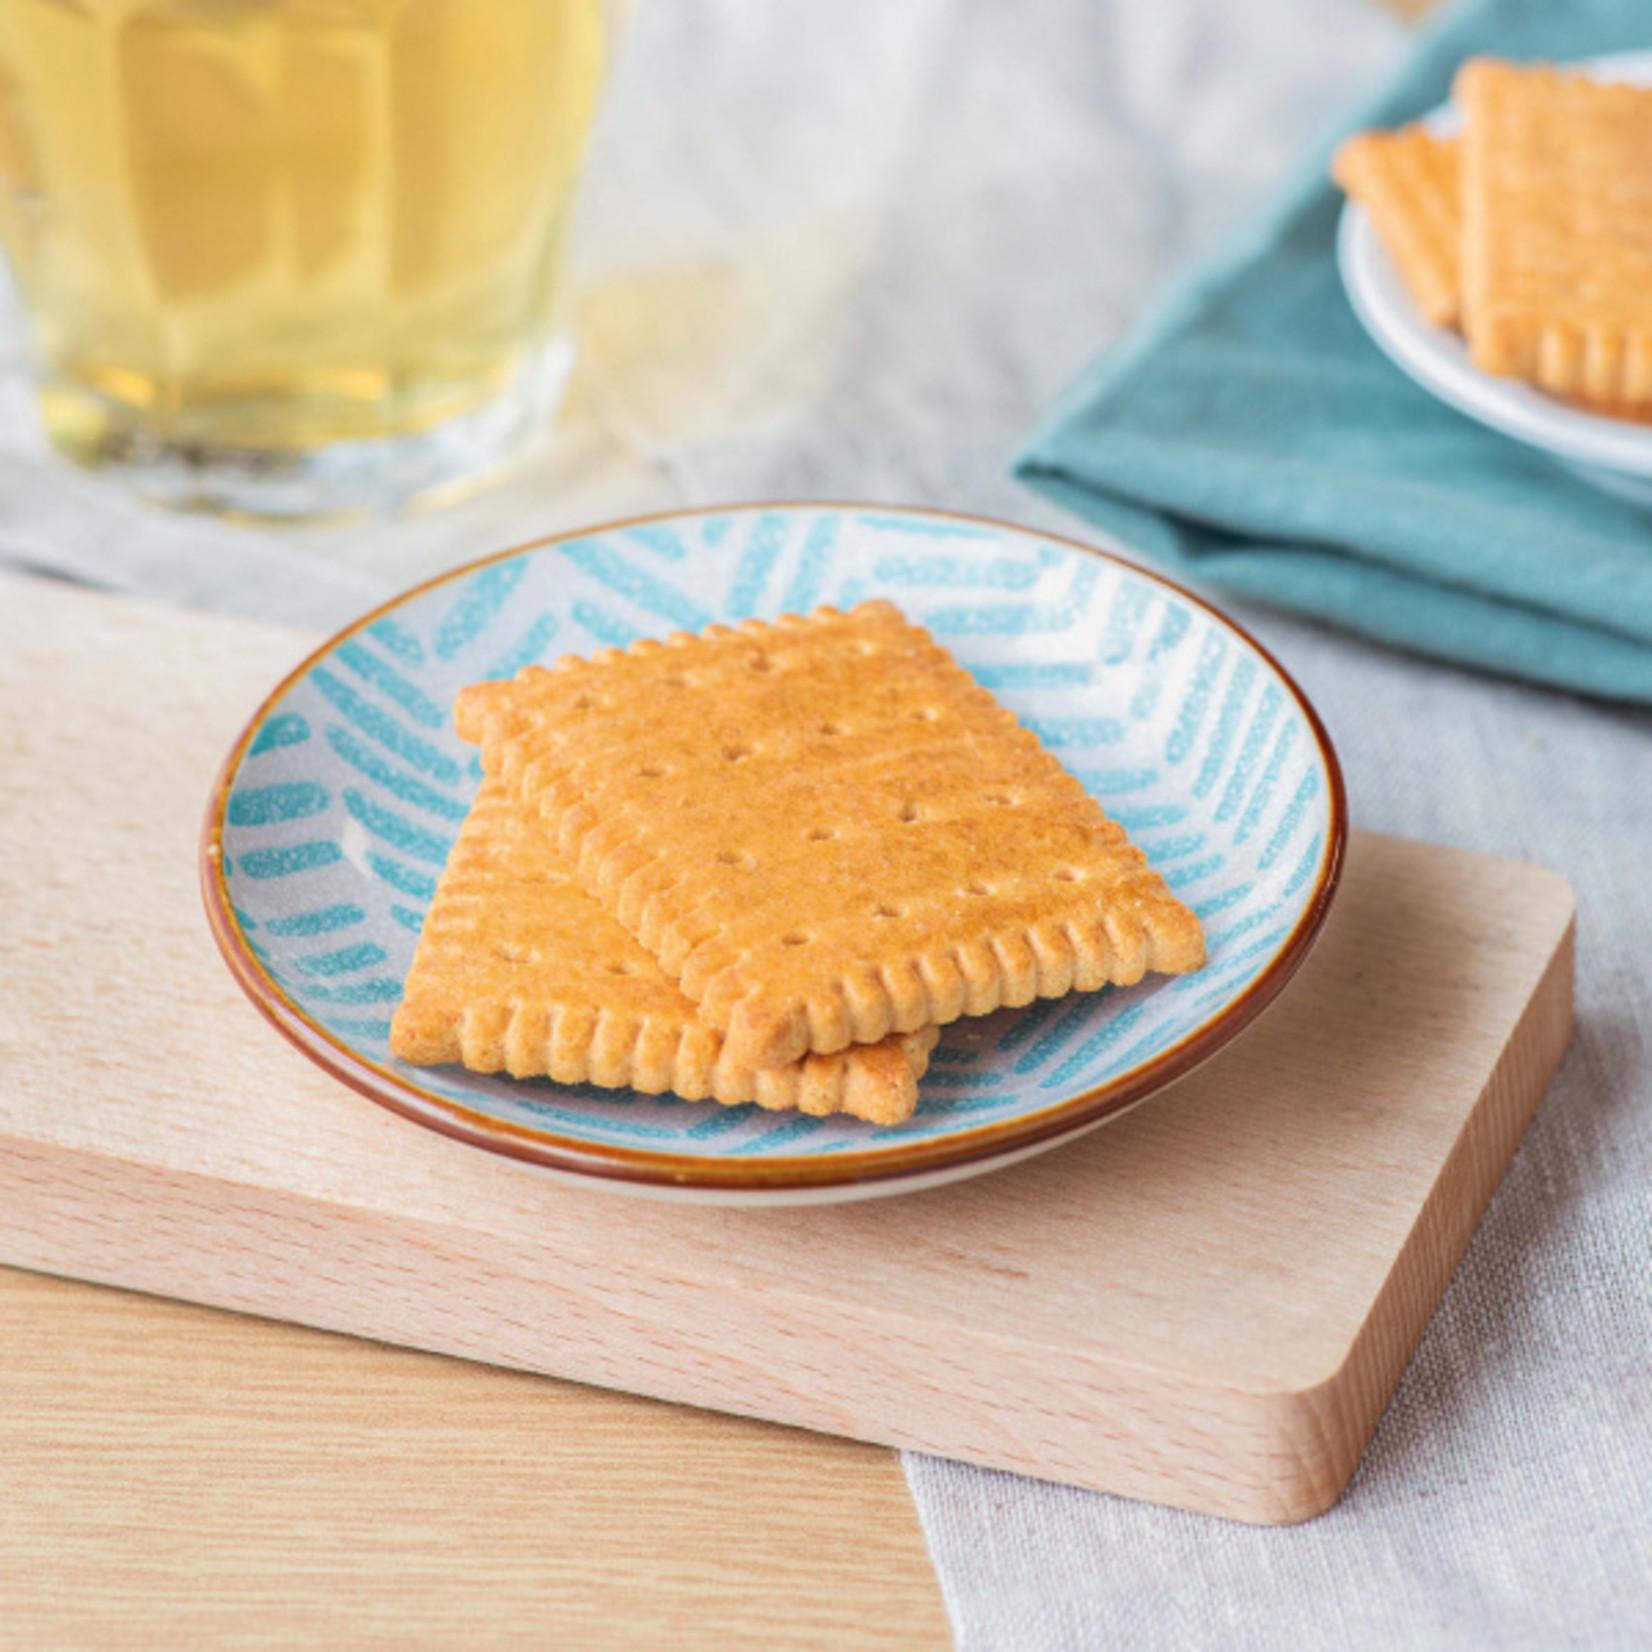 Powerslim PS07010 boter vanille bisuit